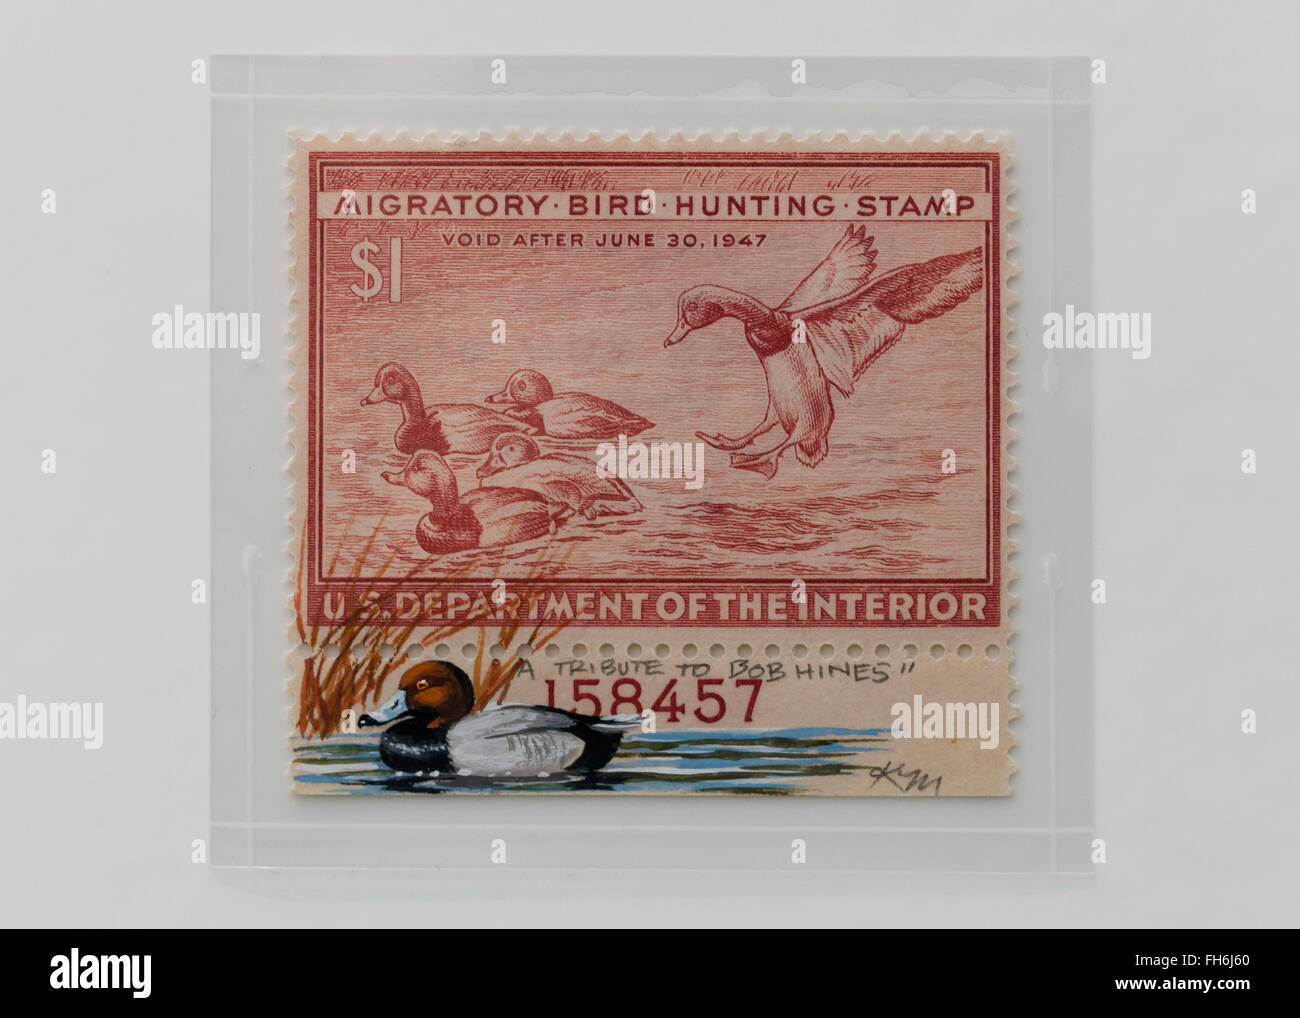 Vintage $1 Migratory Bird Hunting Stamp - USA - Stock Image